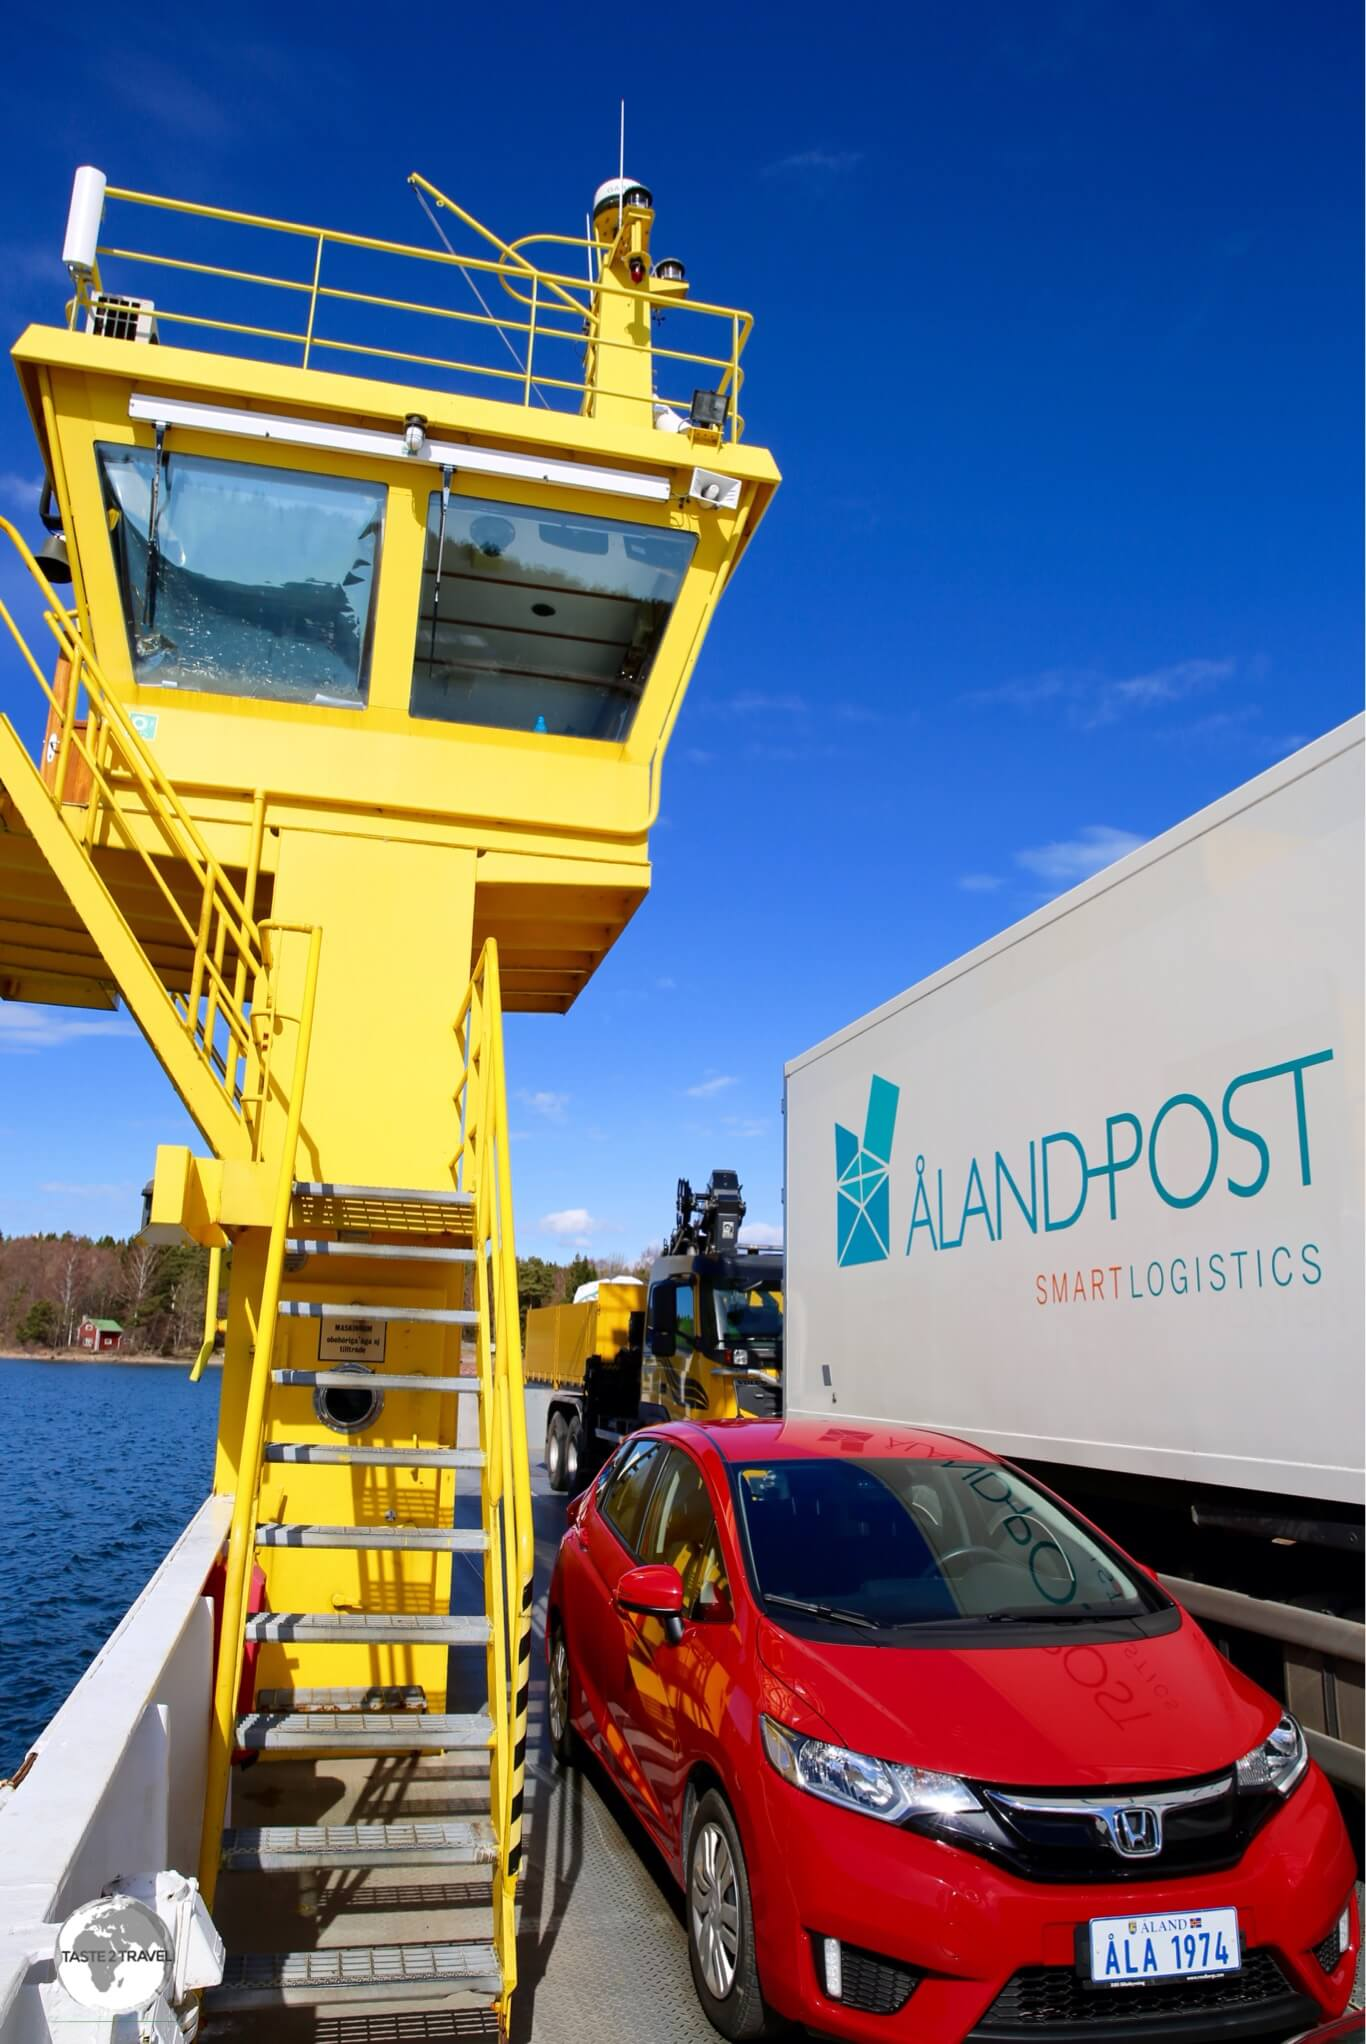 My rental car on a Cable ferry to Vårdö island.